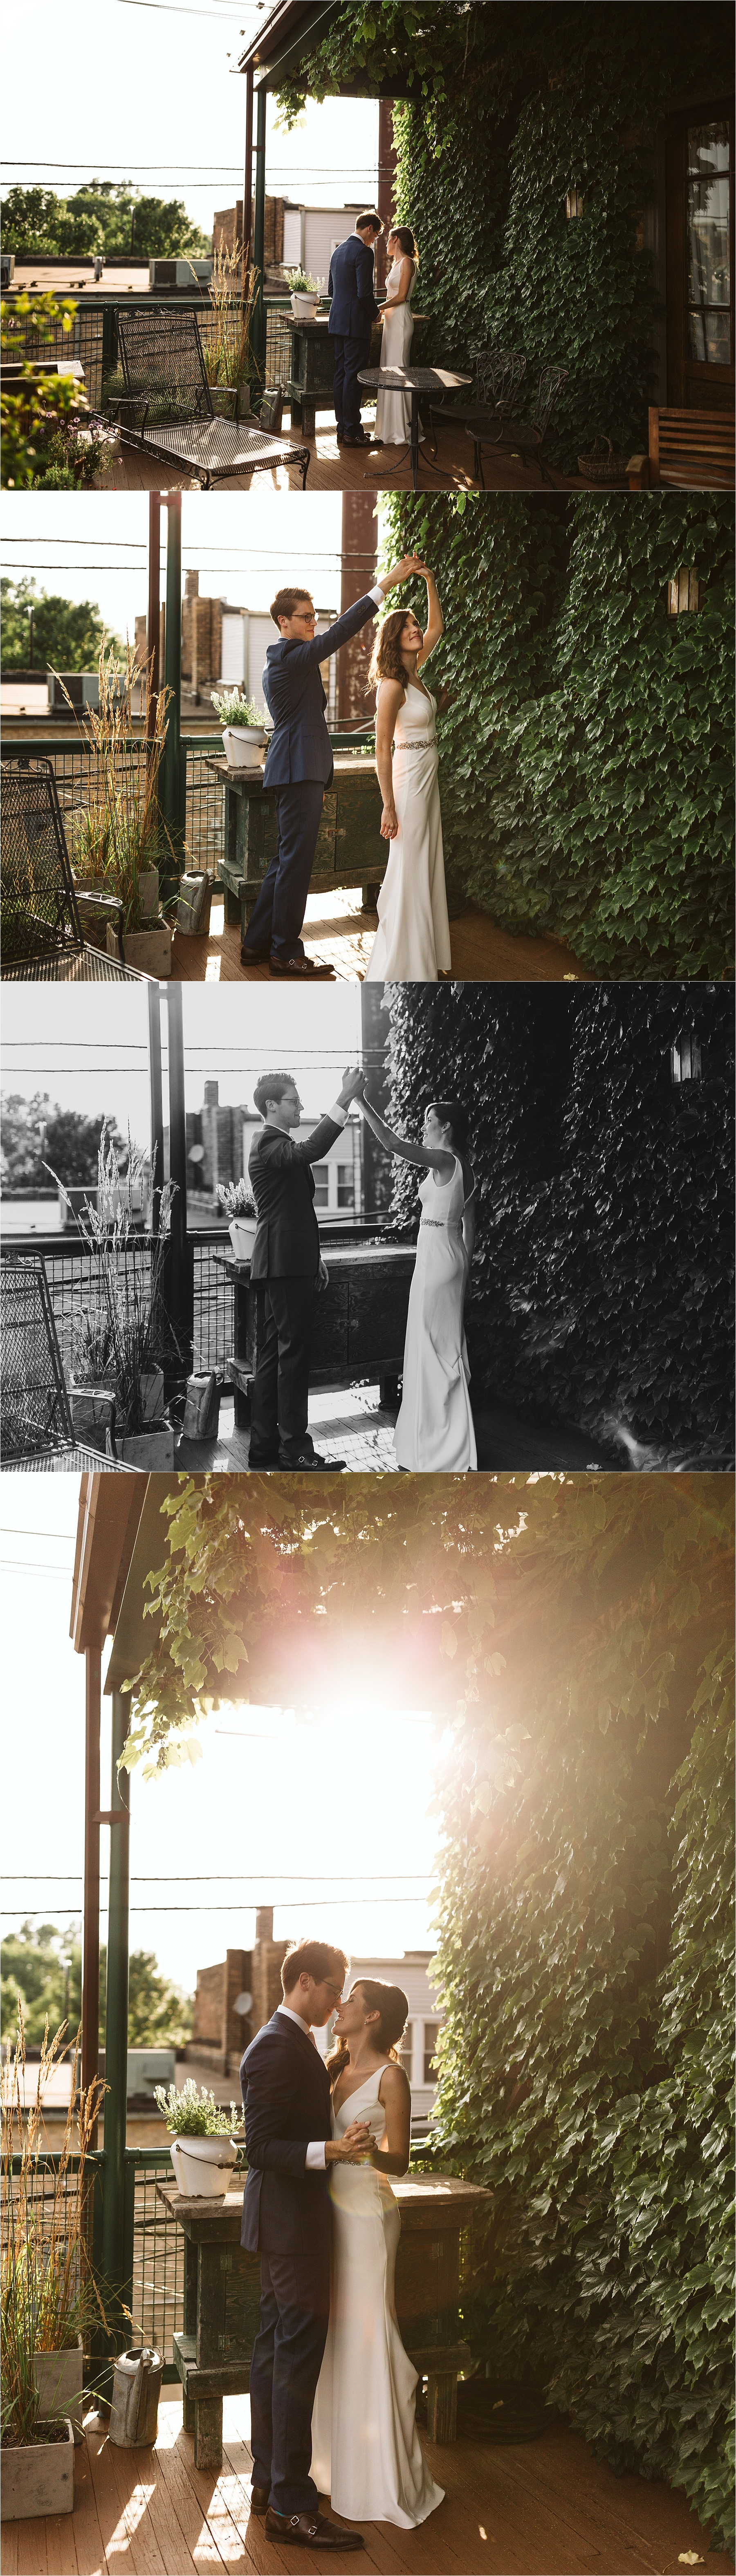 Intimate Firehouse Chicago Wedding_0024.jpg